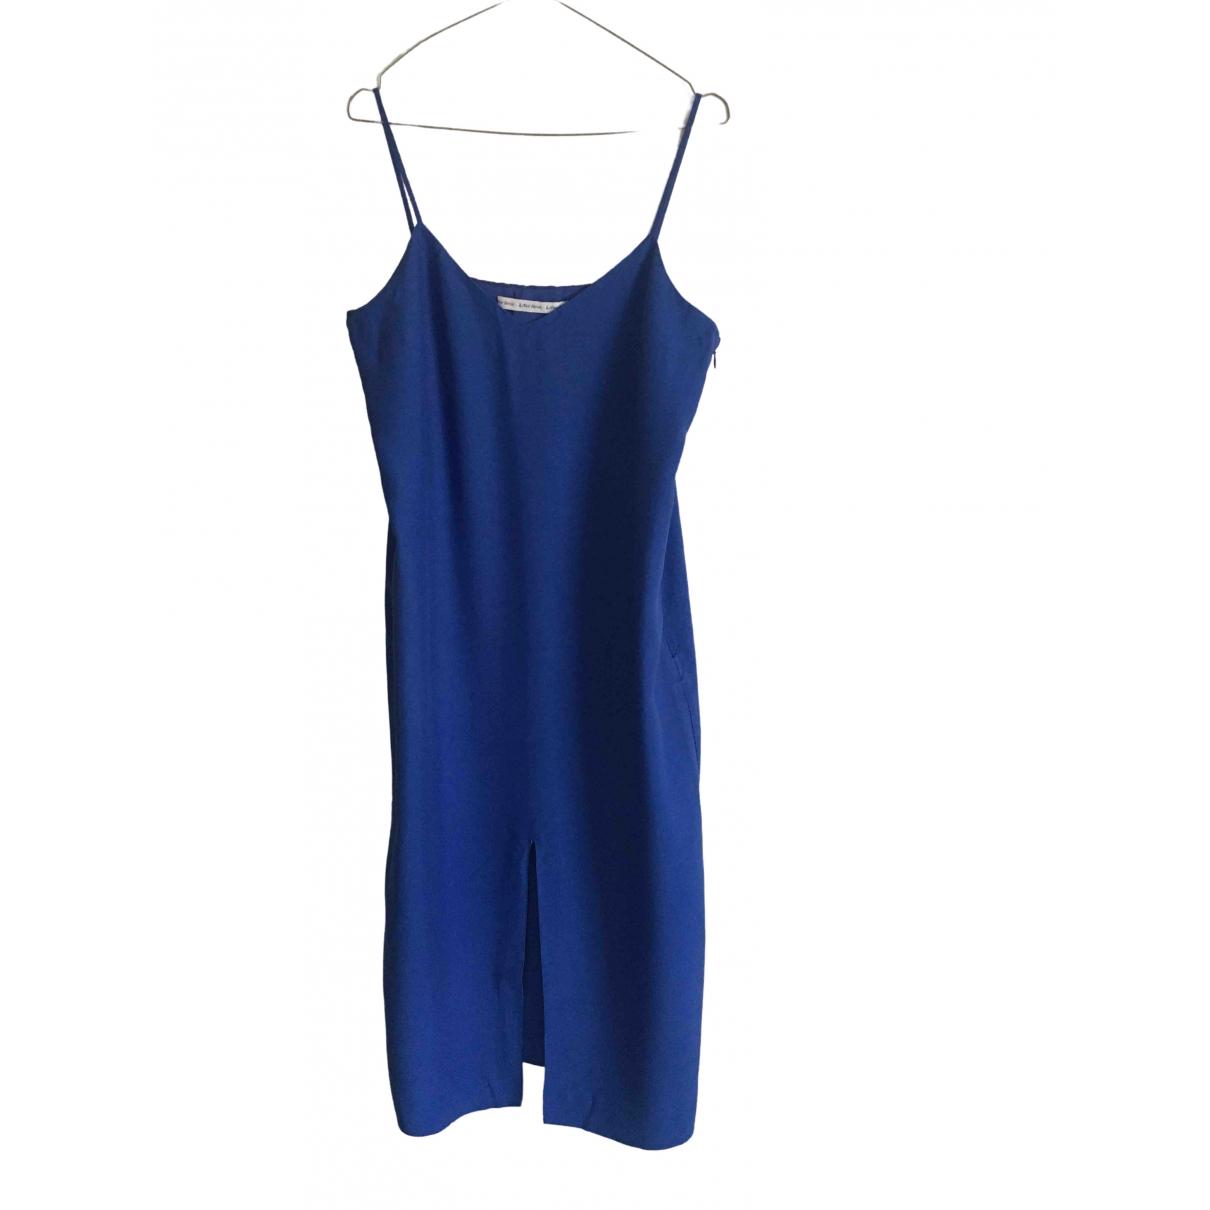 & Other Stories - Robe   pour femme - bleu